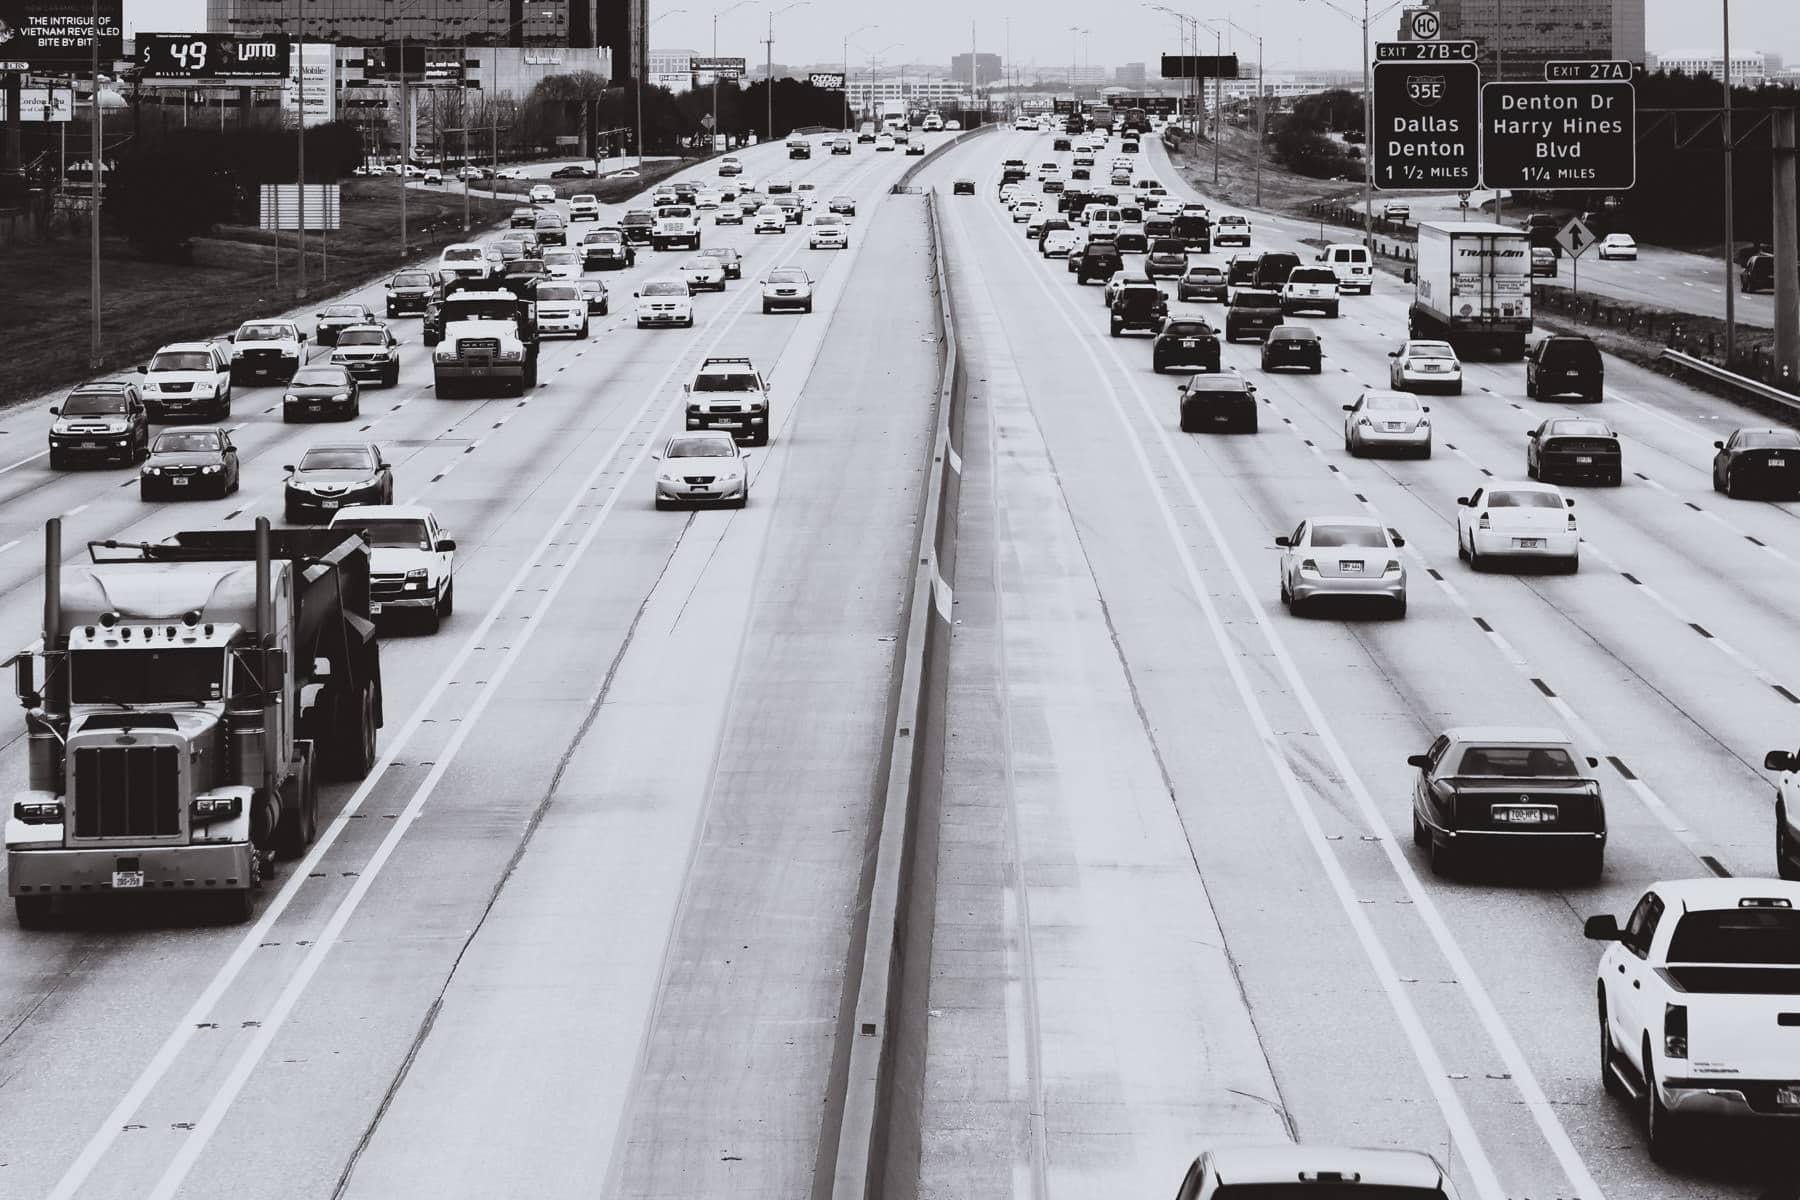 Saturday afternoon on Dallas' Interstate 635 (LBJ Freeway)